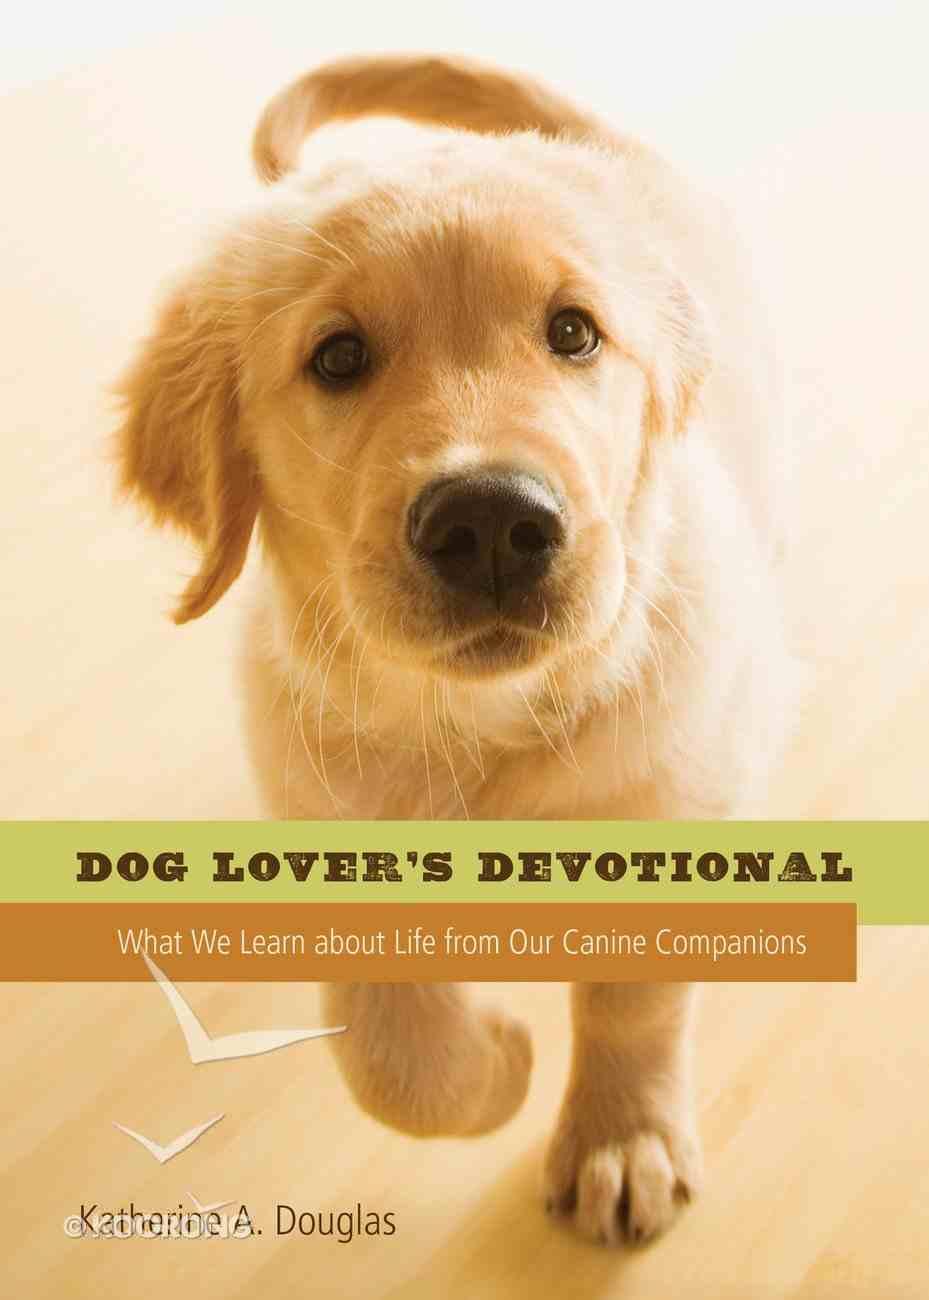 Dog Lover's Devotional eBook